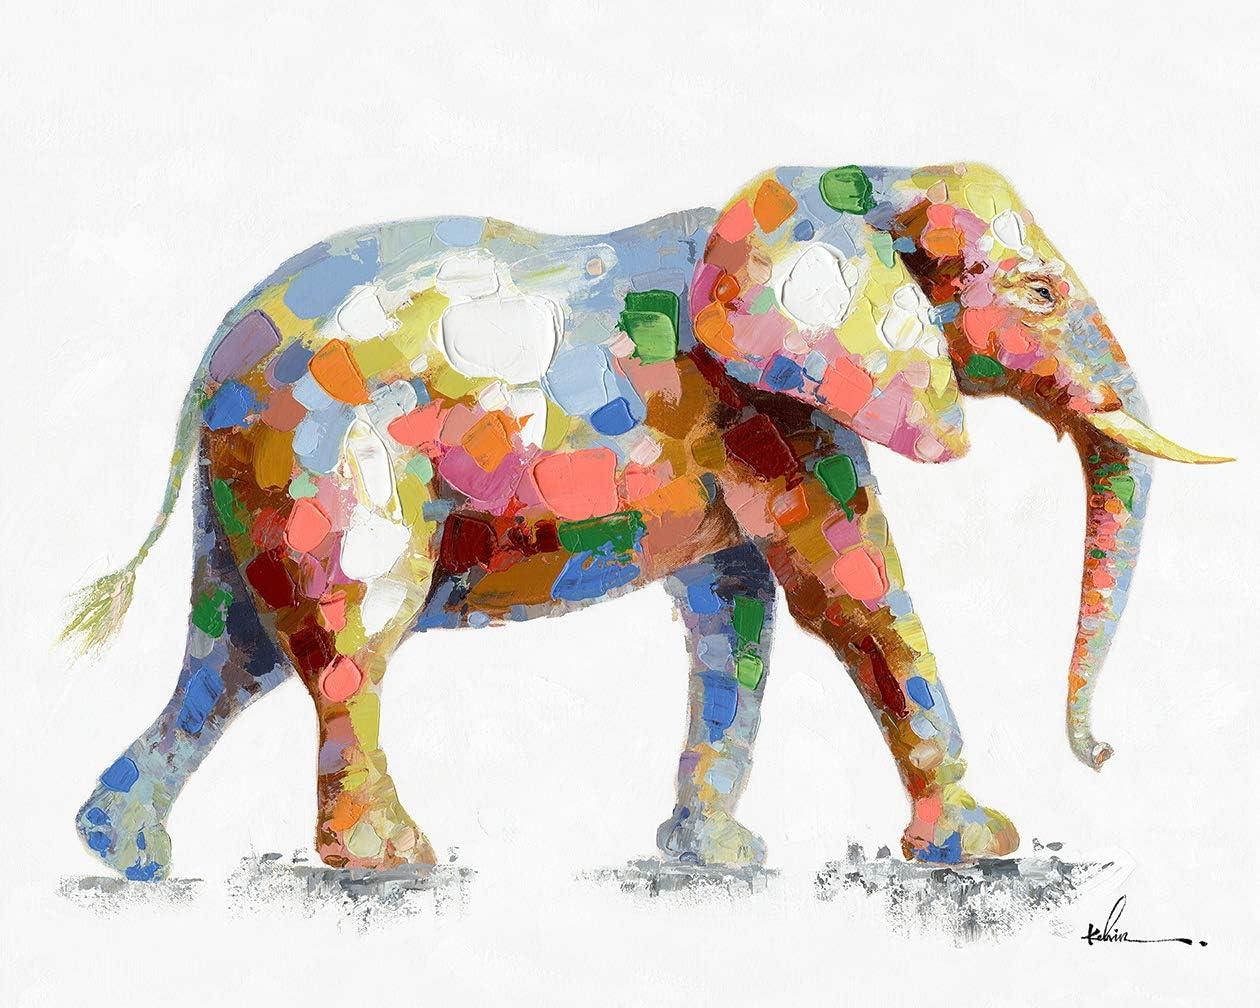 - Amazon.com: Colorful Elephant Wall Art Modern Printing On Canvas